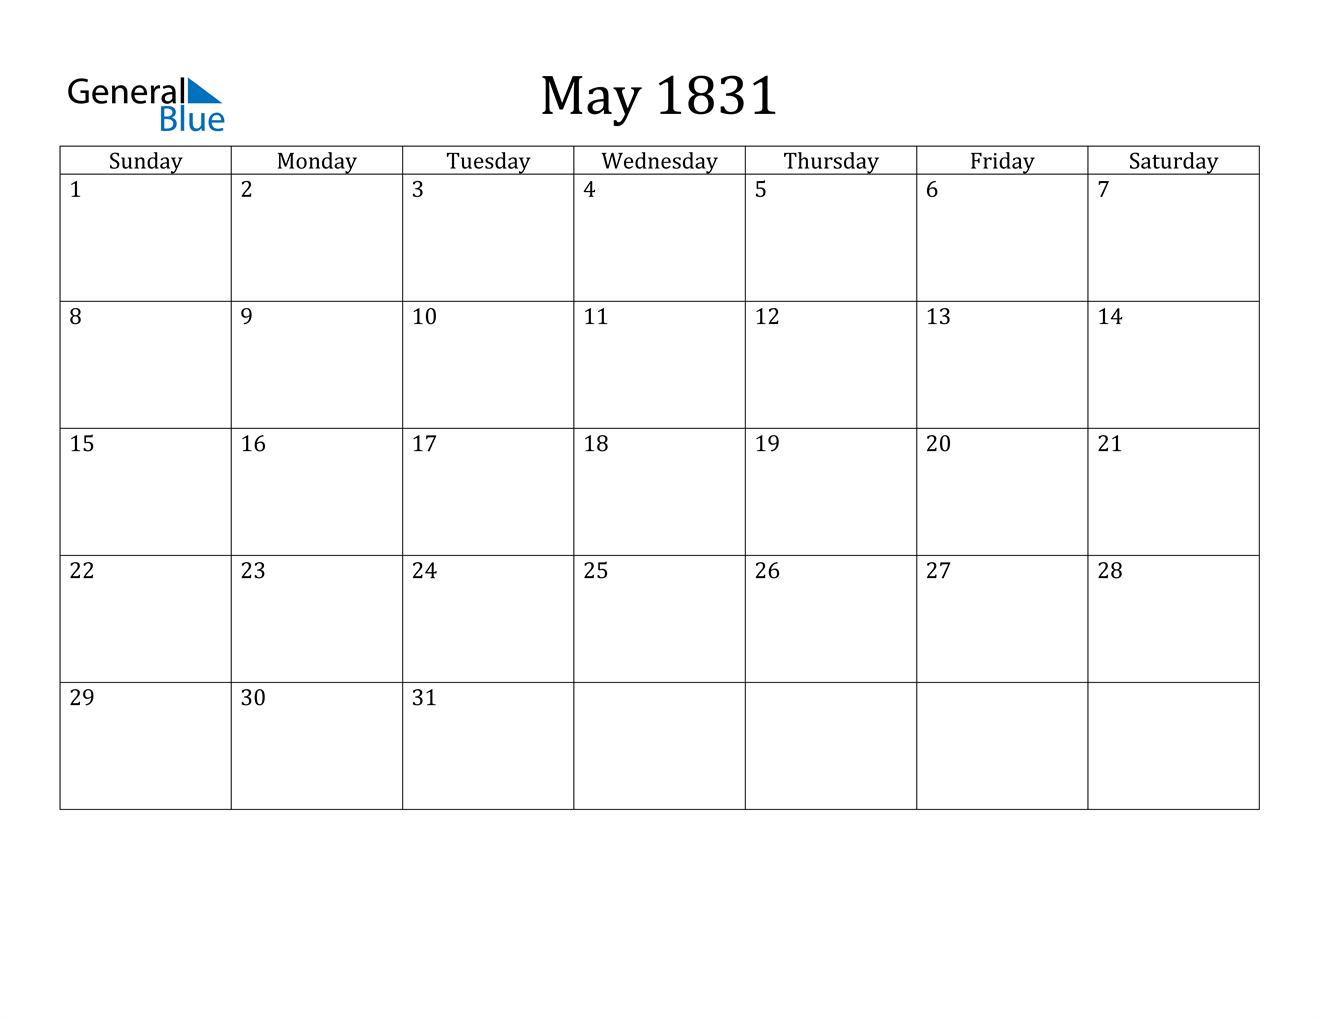 Image of May 1831 Calendar